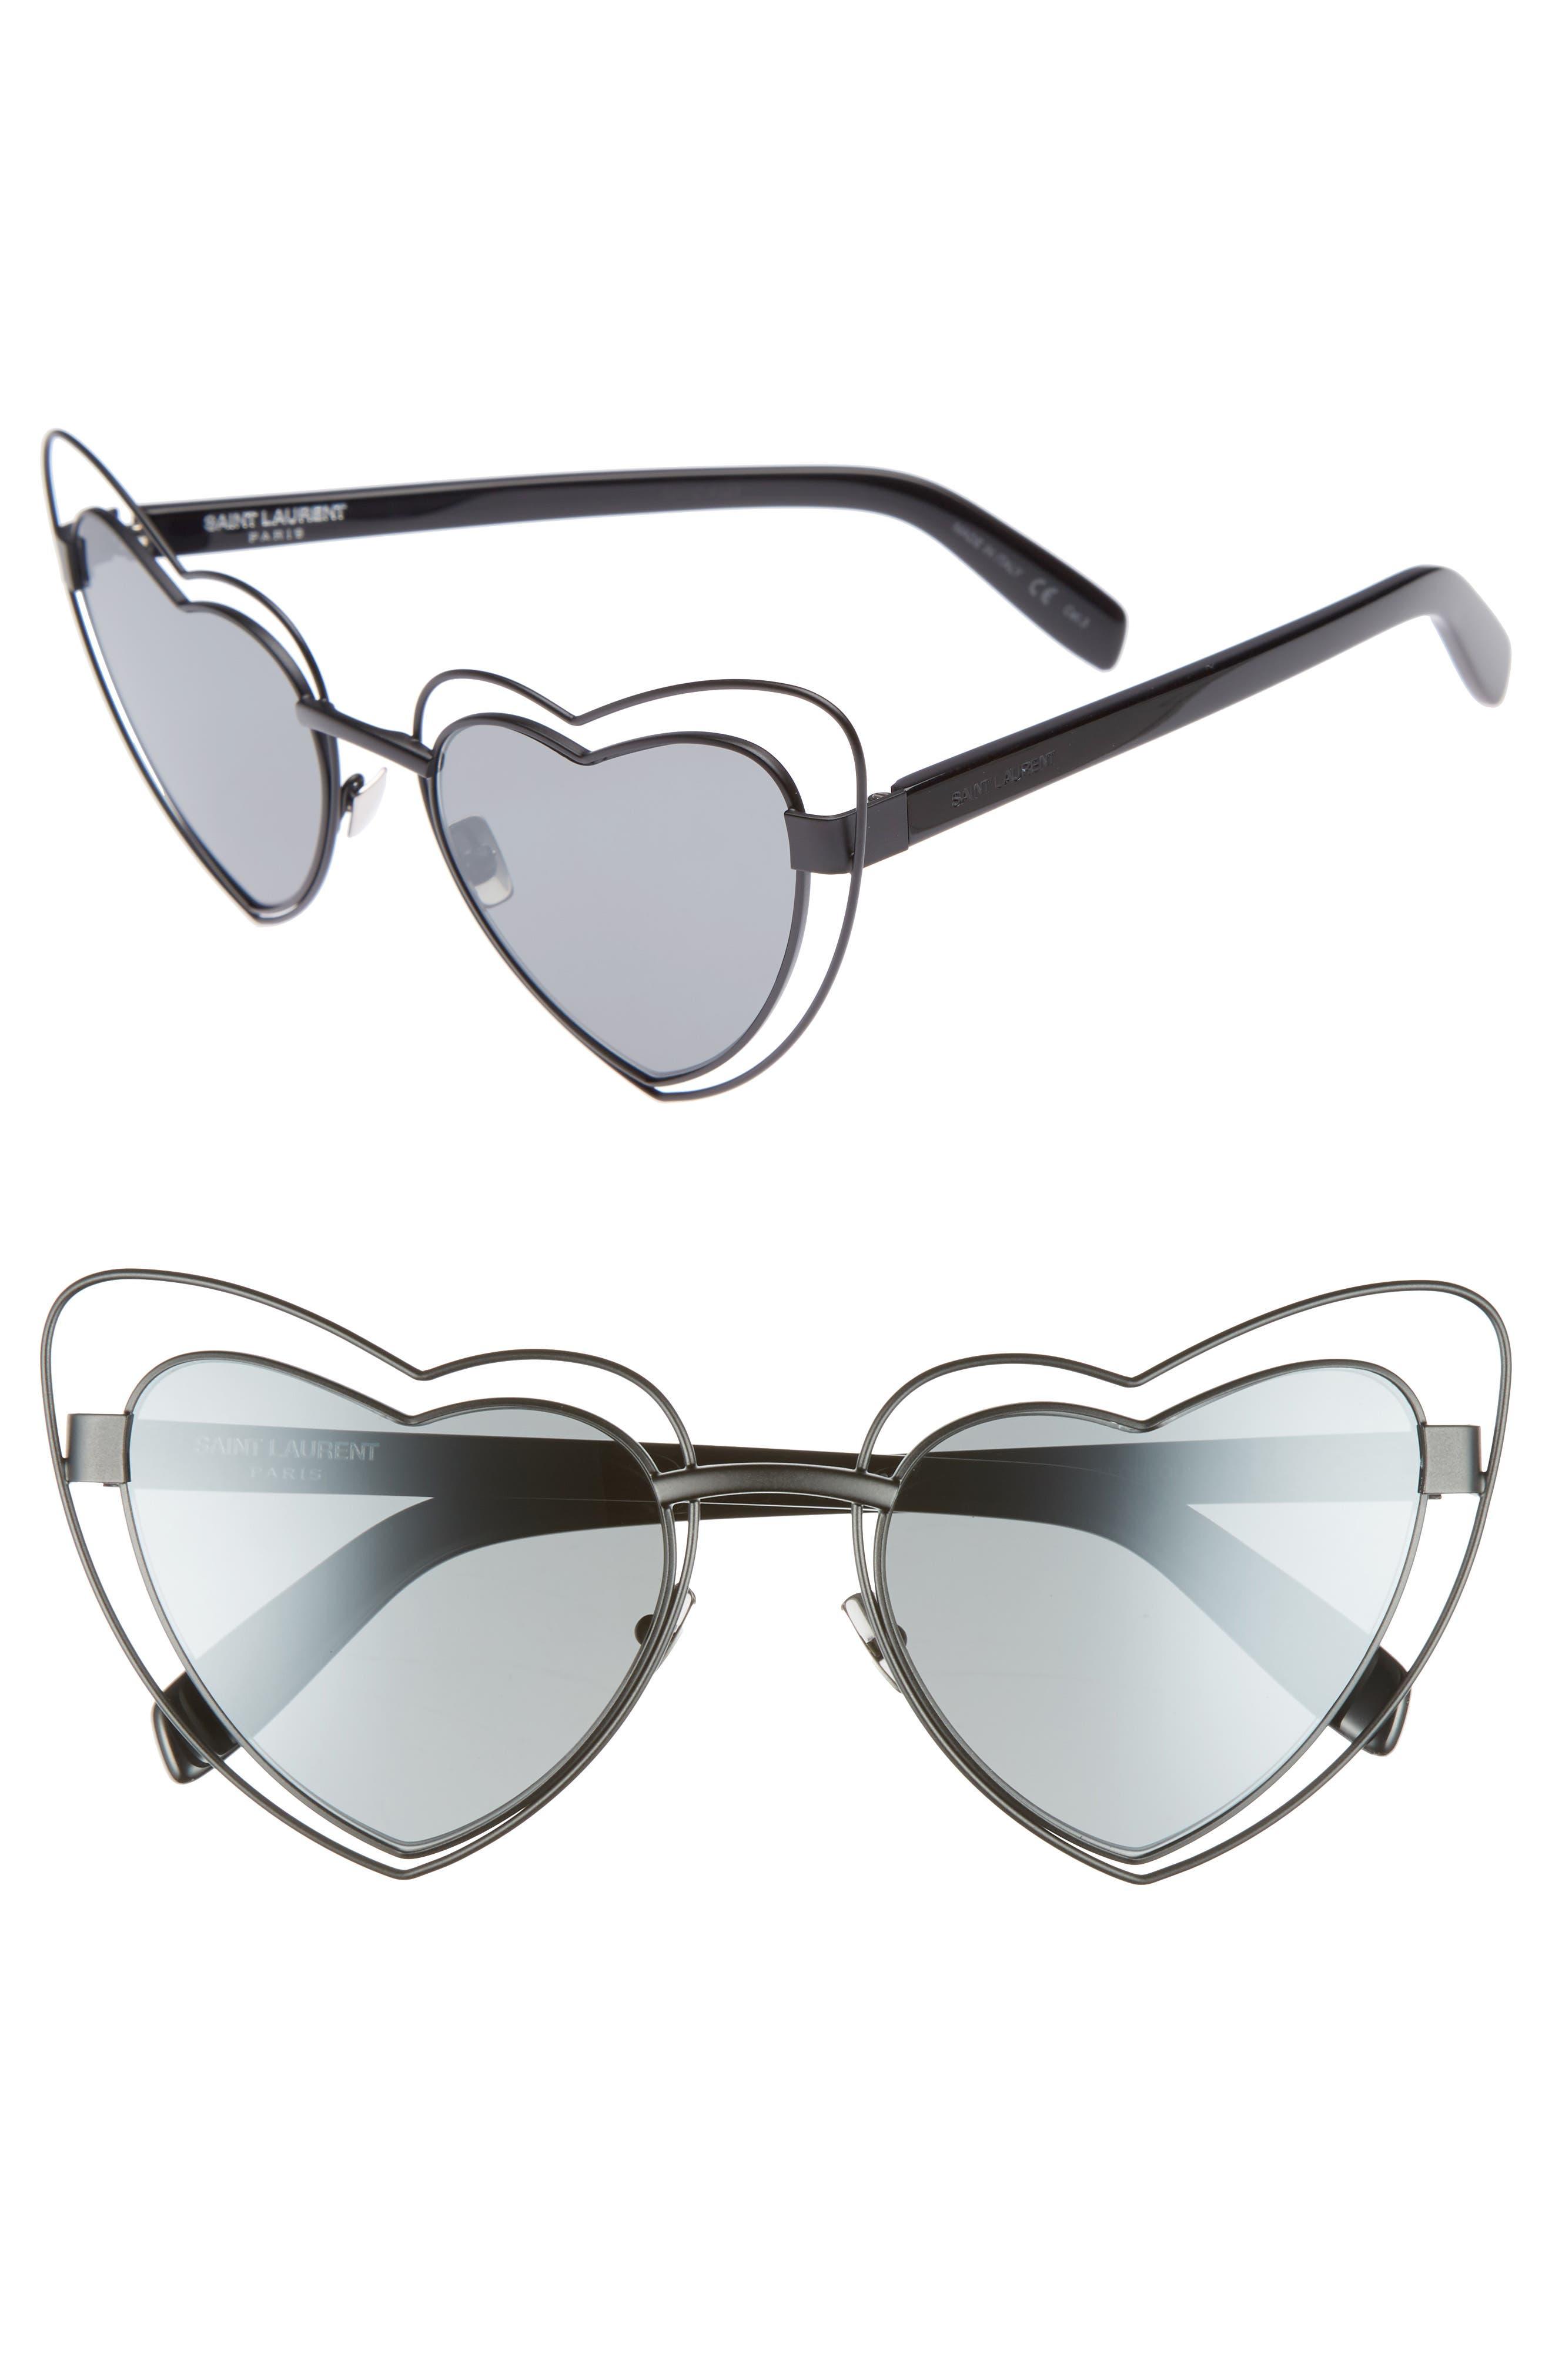 Main Image - Saint Laurent SL197 LouLou 57mm Heart Shaped Sunglasses